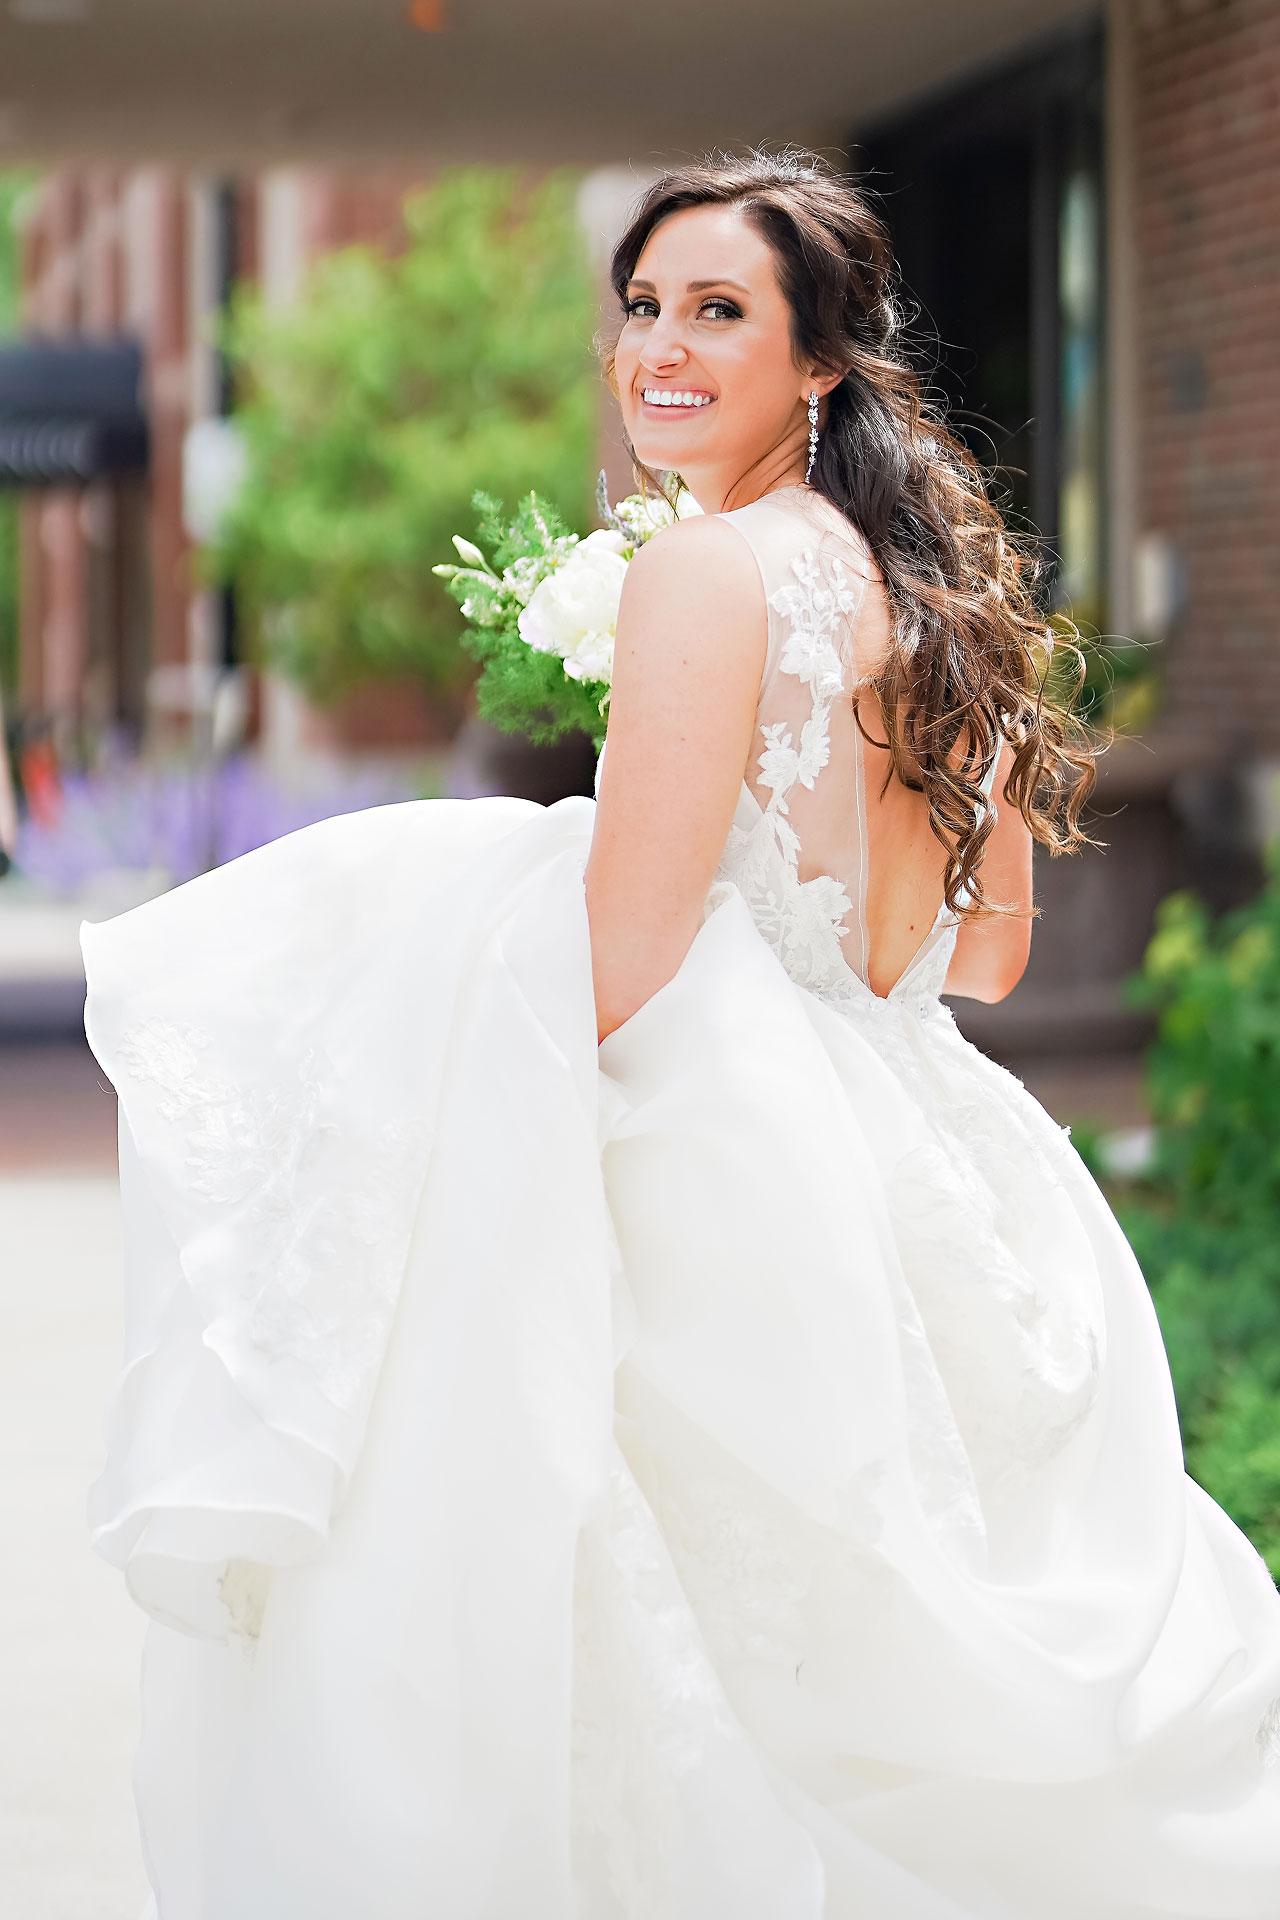 MacKinze John Lafayette Indiana Purdue Wedding 124